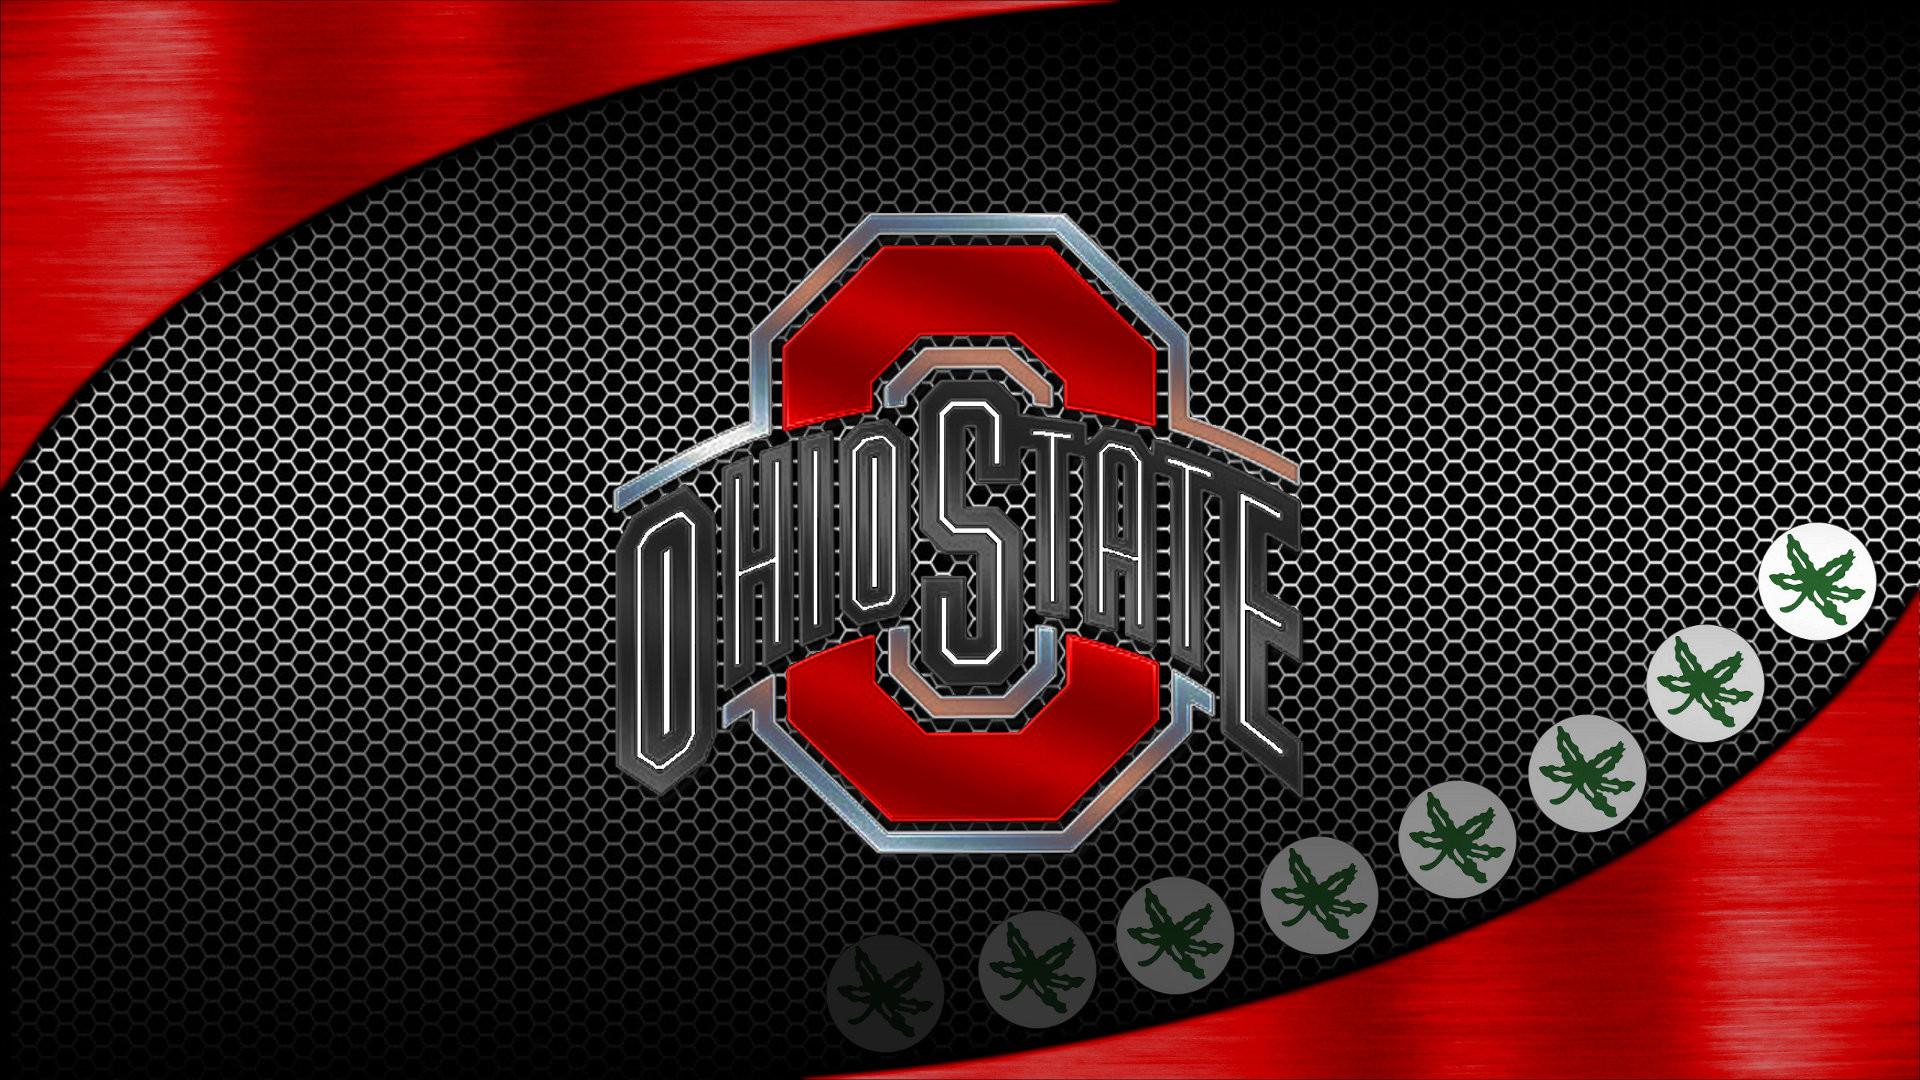 OSU Wallpaper 532 · BuckeyesDesktop WallpapersState UniversityOhio